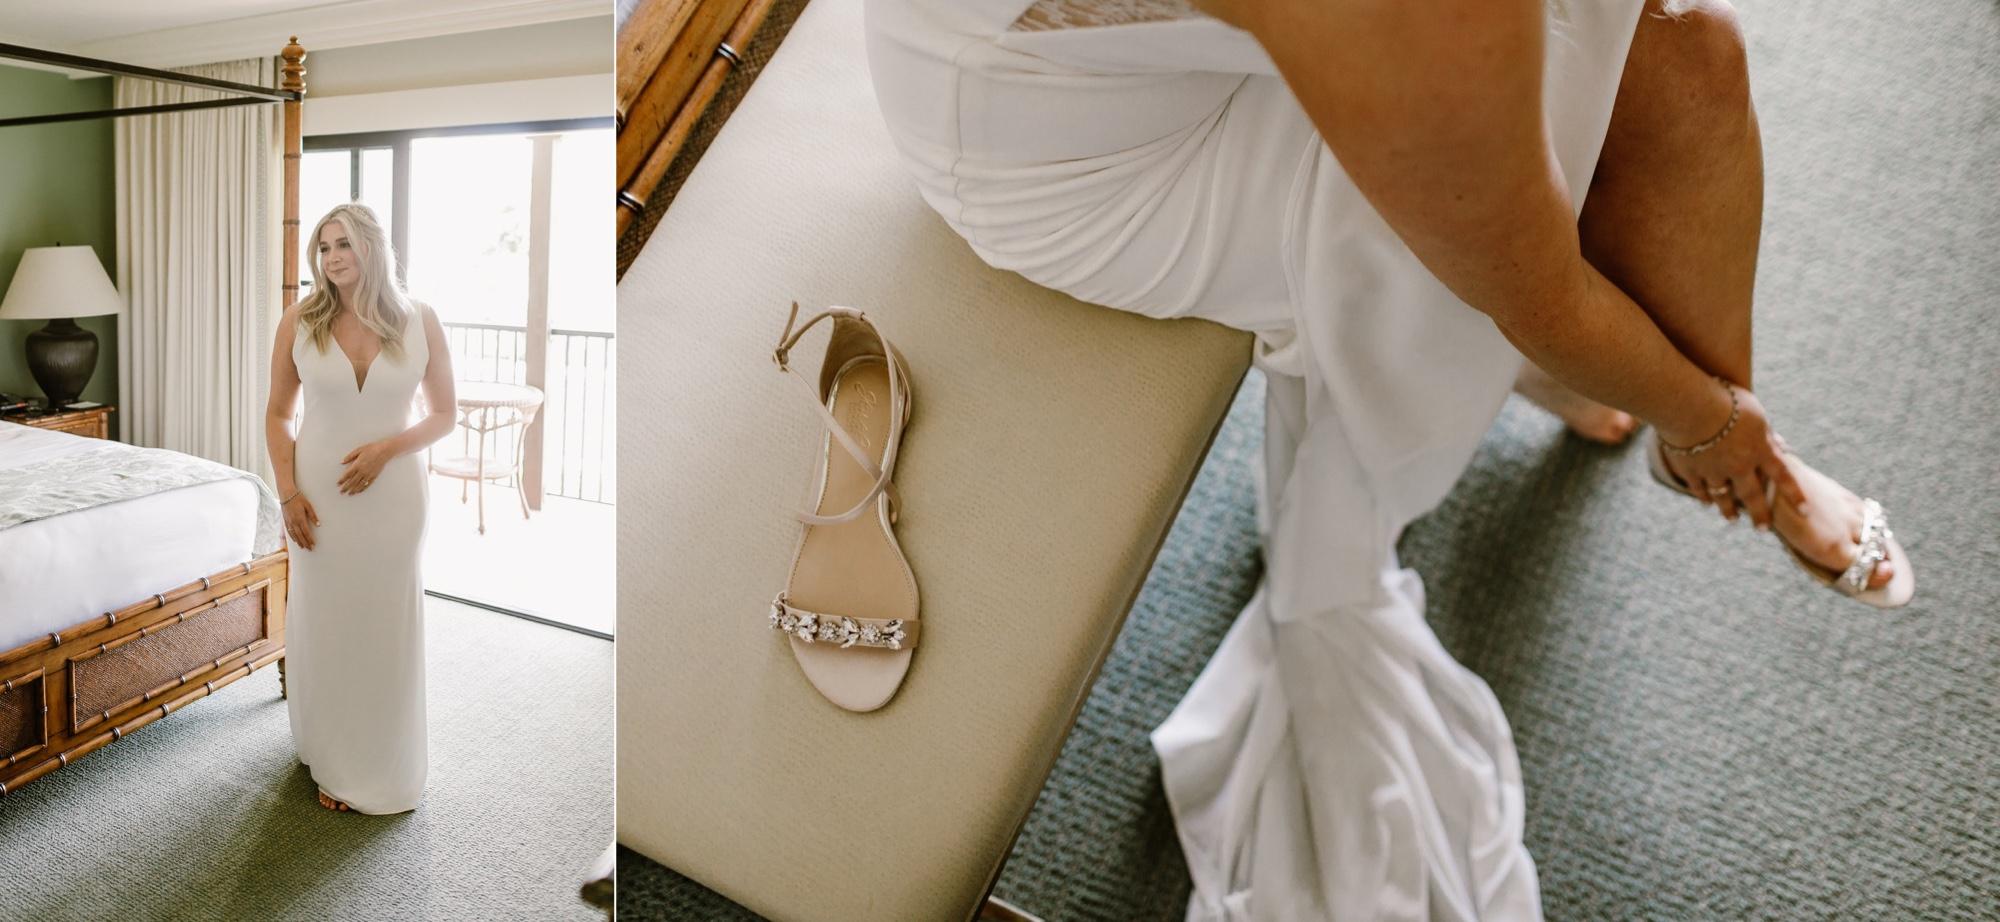 06_Ally and Tommy's Wedding-302_Ally and Tommy's Wedding-297_inn_dress_santa_wedding_barbara_hotel.jpg